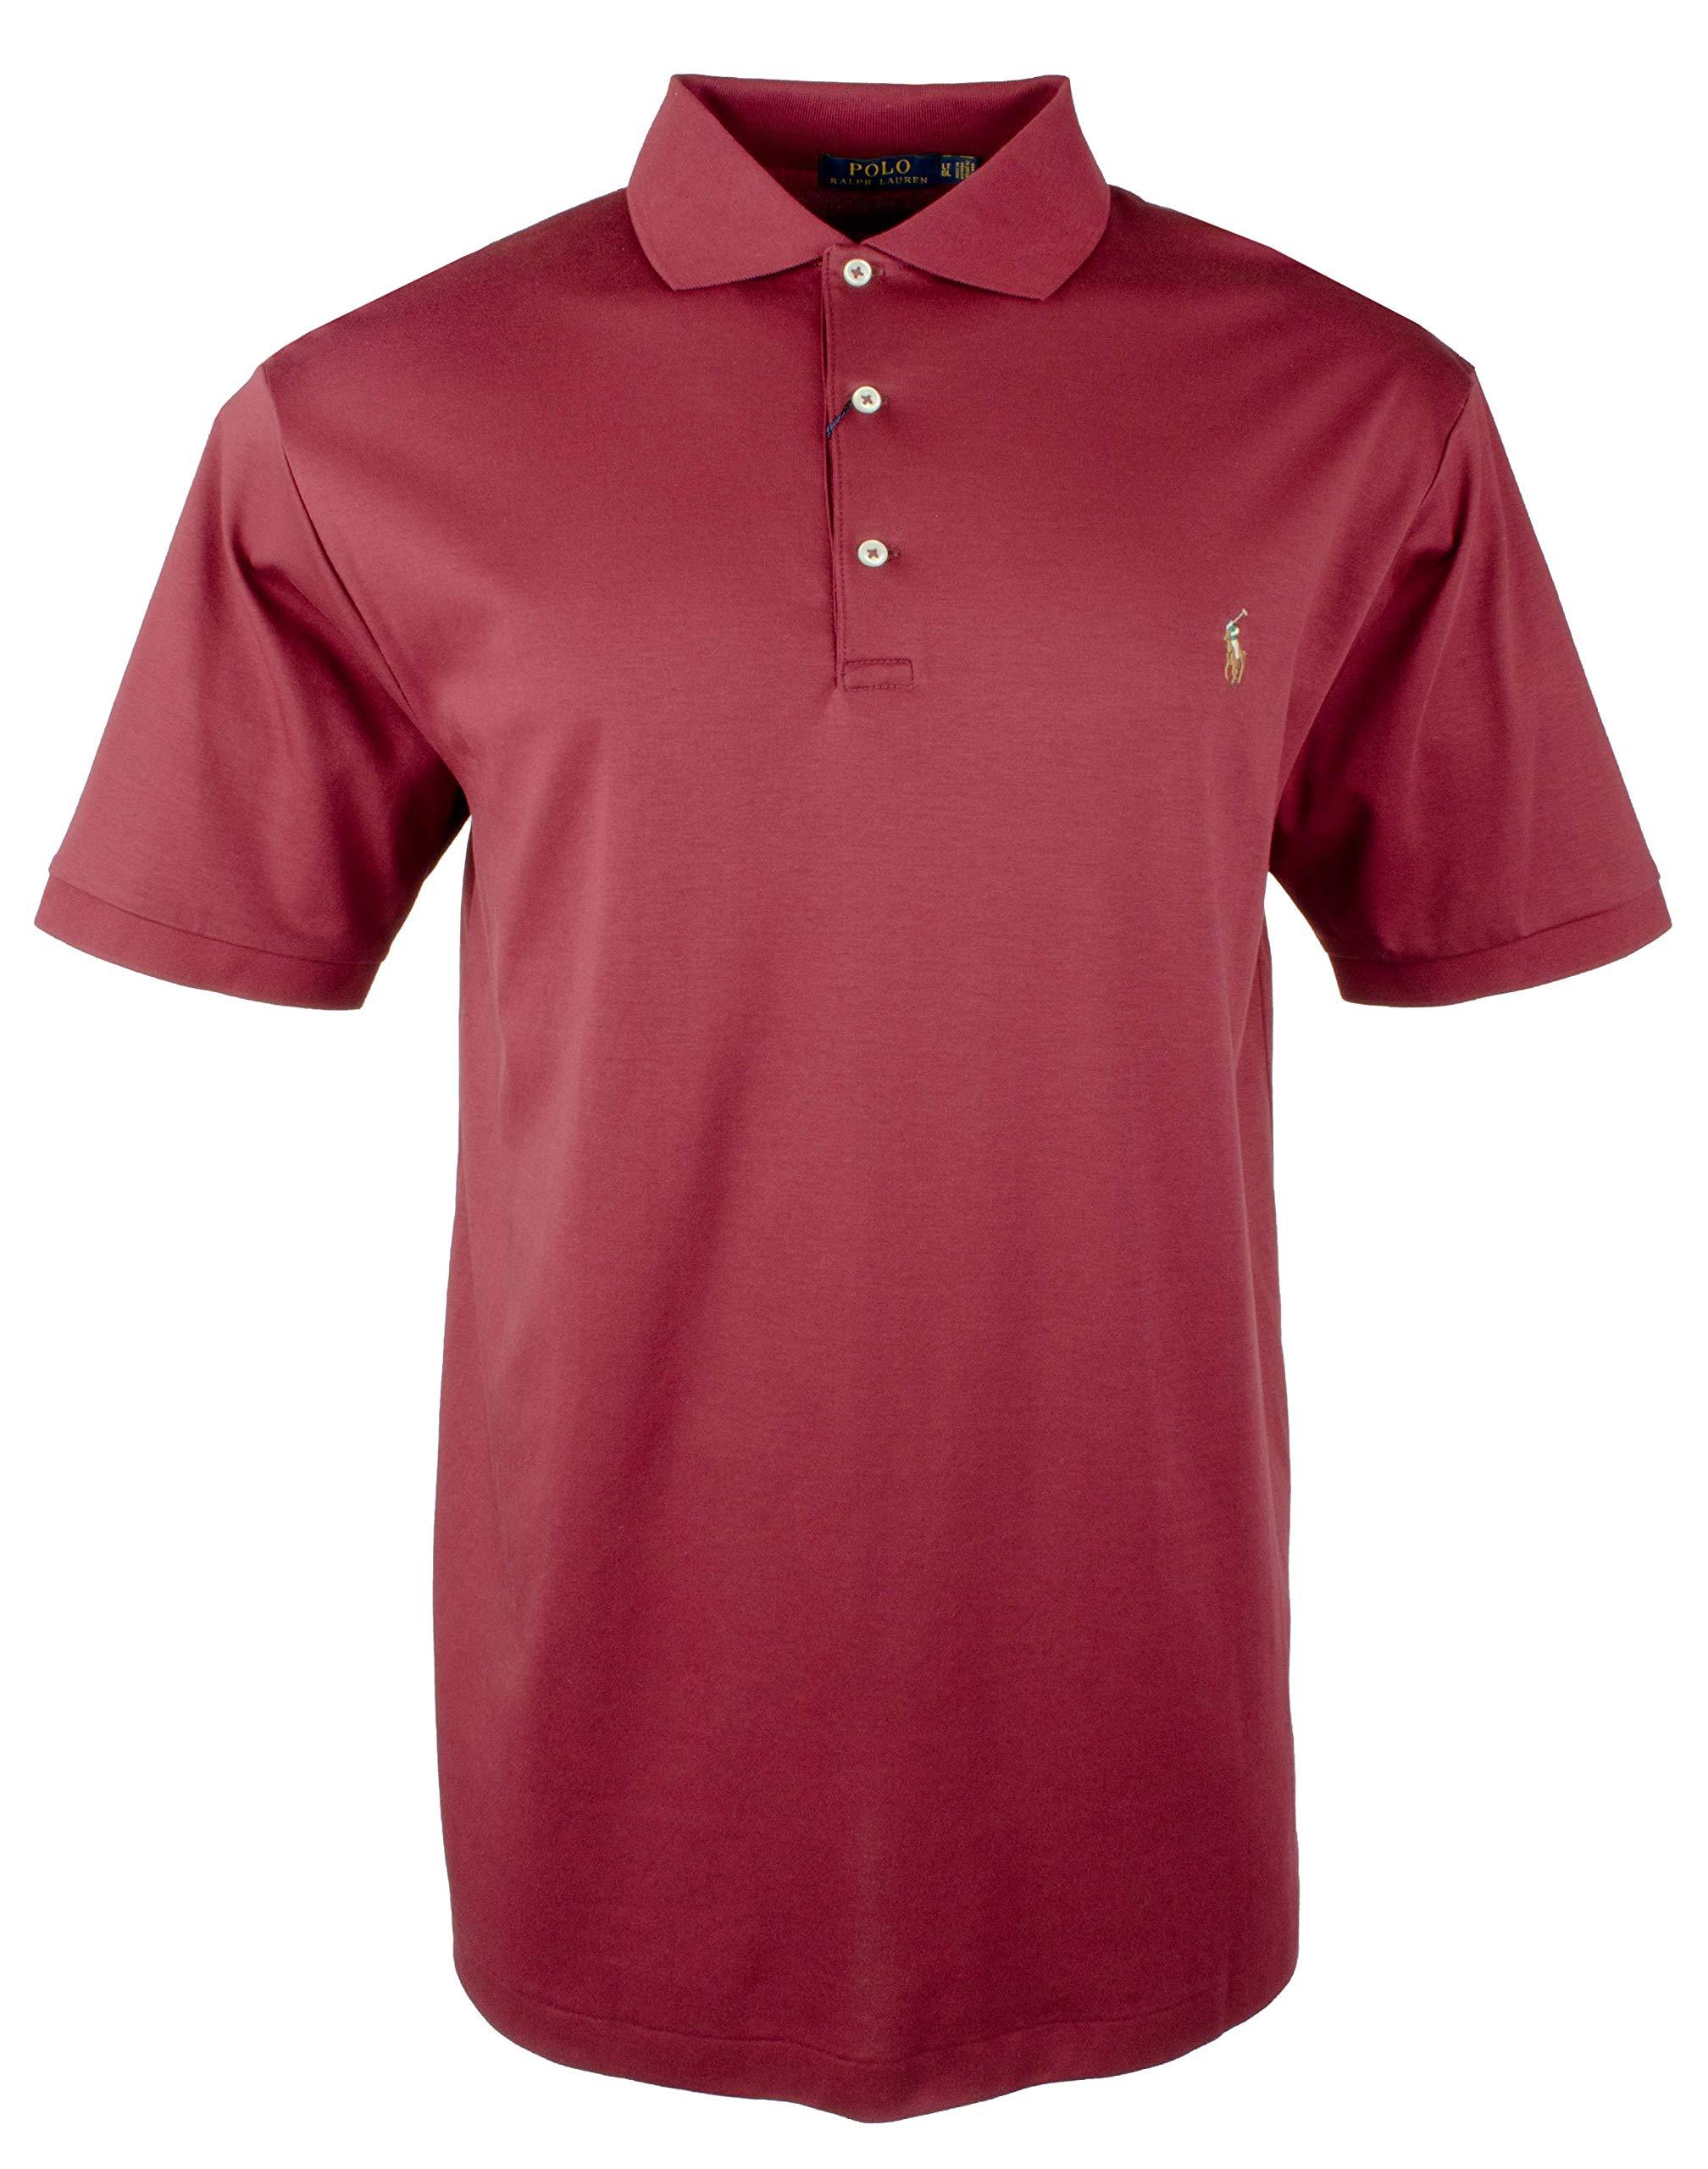 Polo Ralph Lauren Men's Big & Tall Classic Fit Cotton Soft Polo Shirt-R-3LT